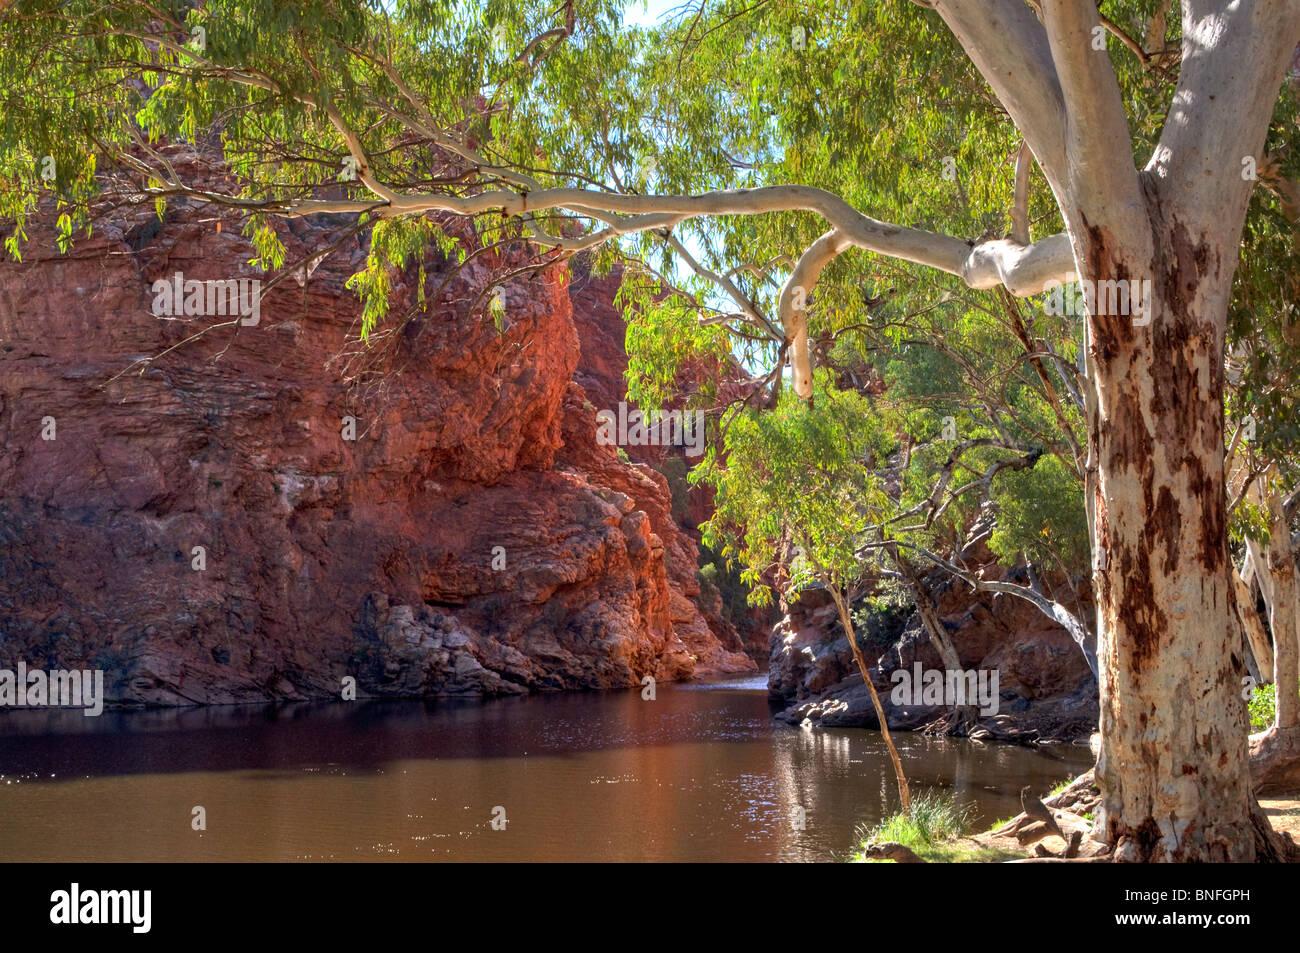 Ellery Creek Big Hole, West MacDonnell National Park, Northern Territory, Australia - Stock Image